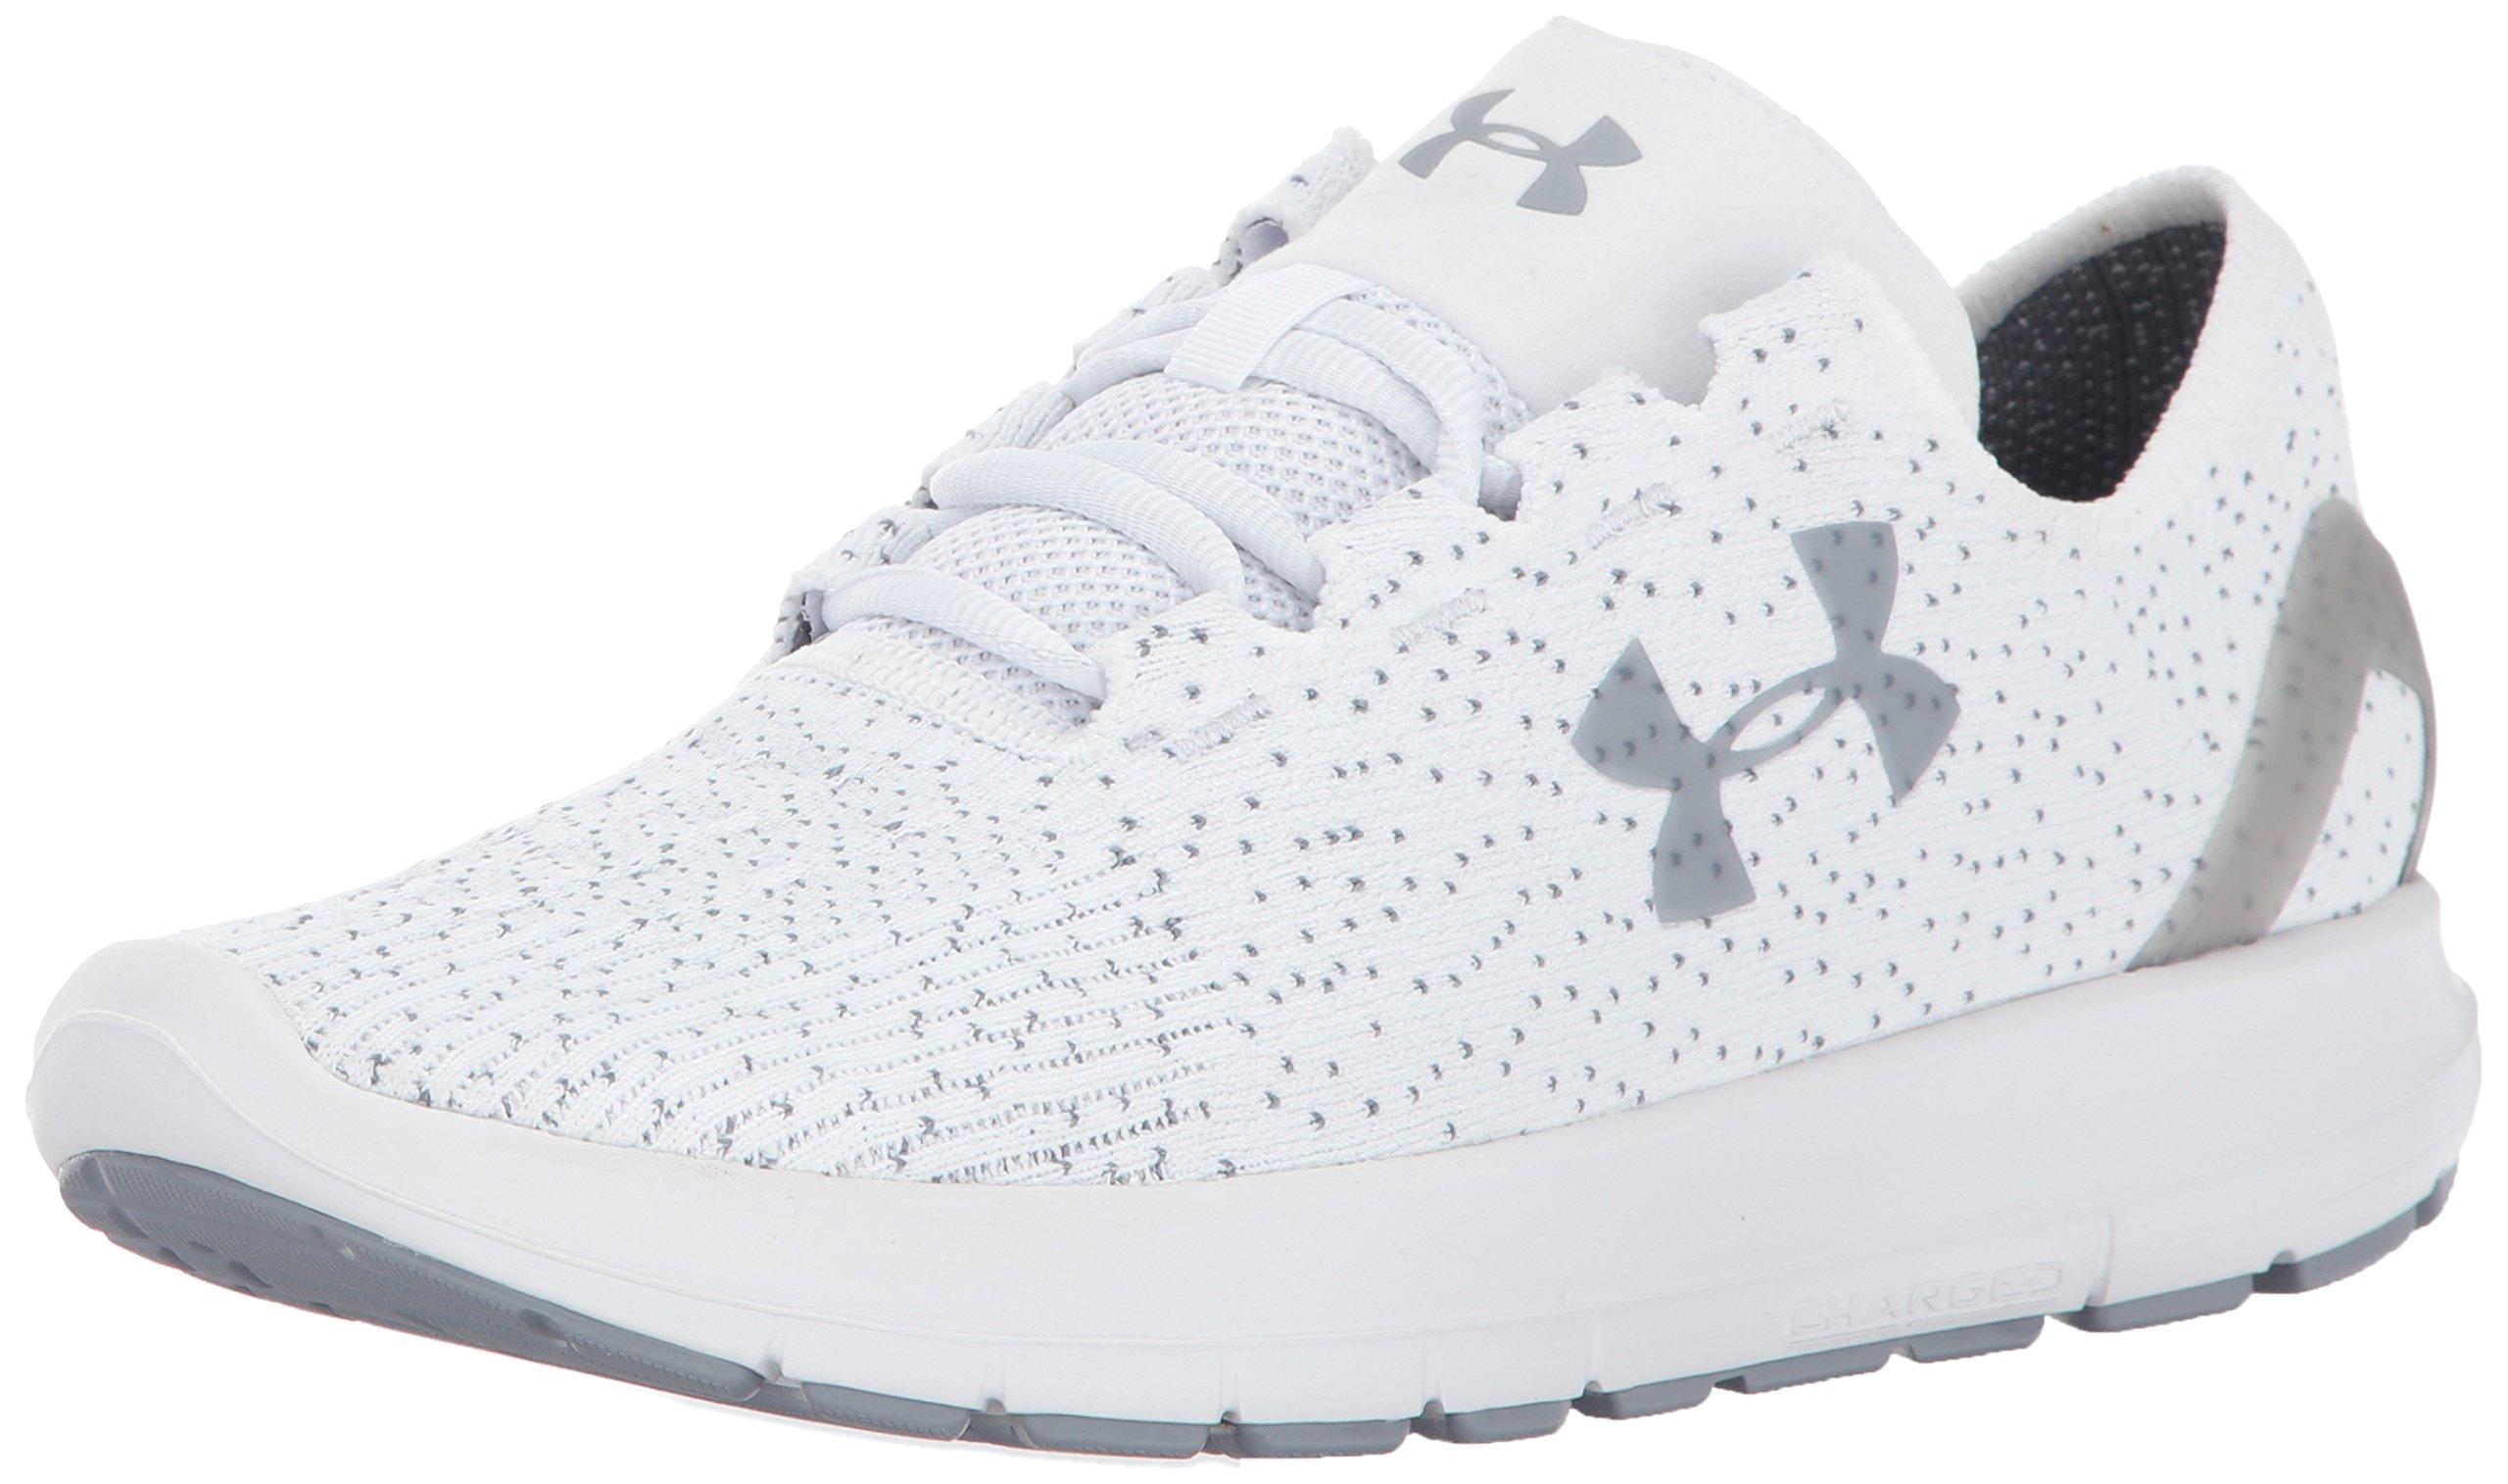 Under Armour Men's Speedform Slingride 1.1 Running Shoe, White, 9